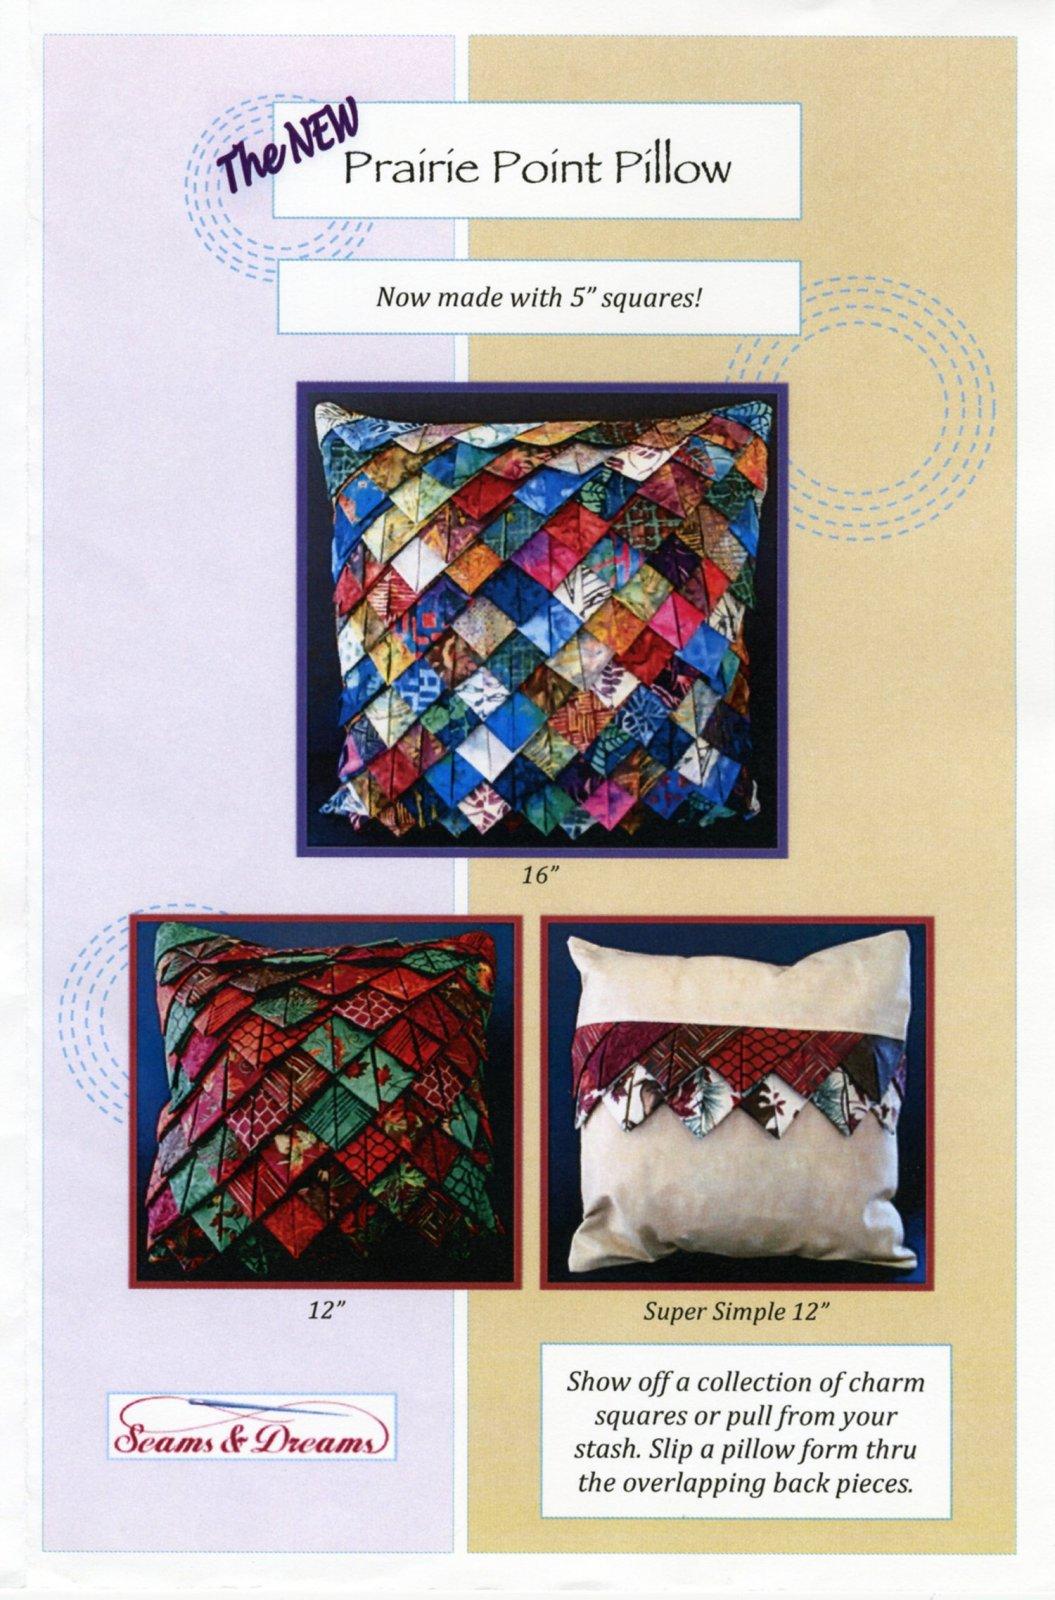 New Prairie Point Pillow